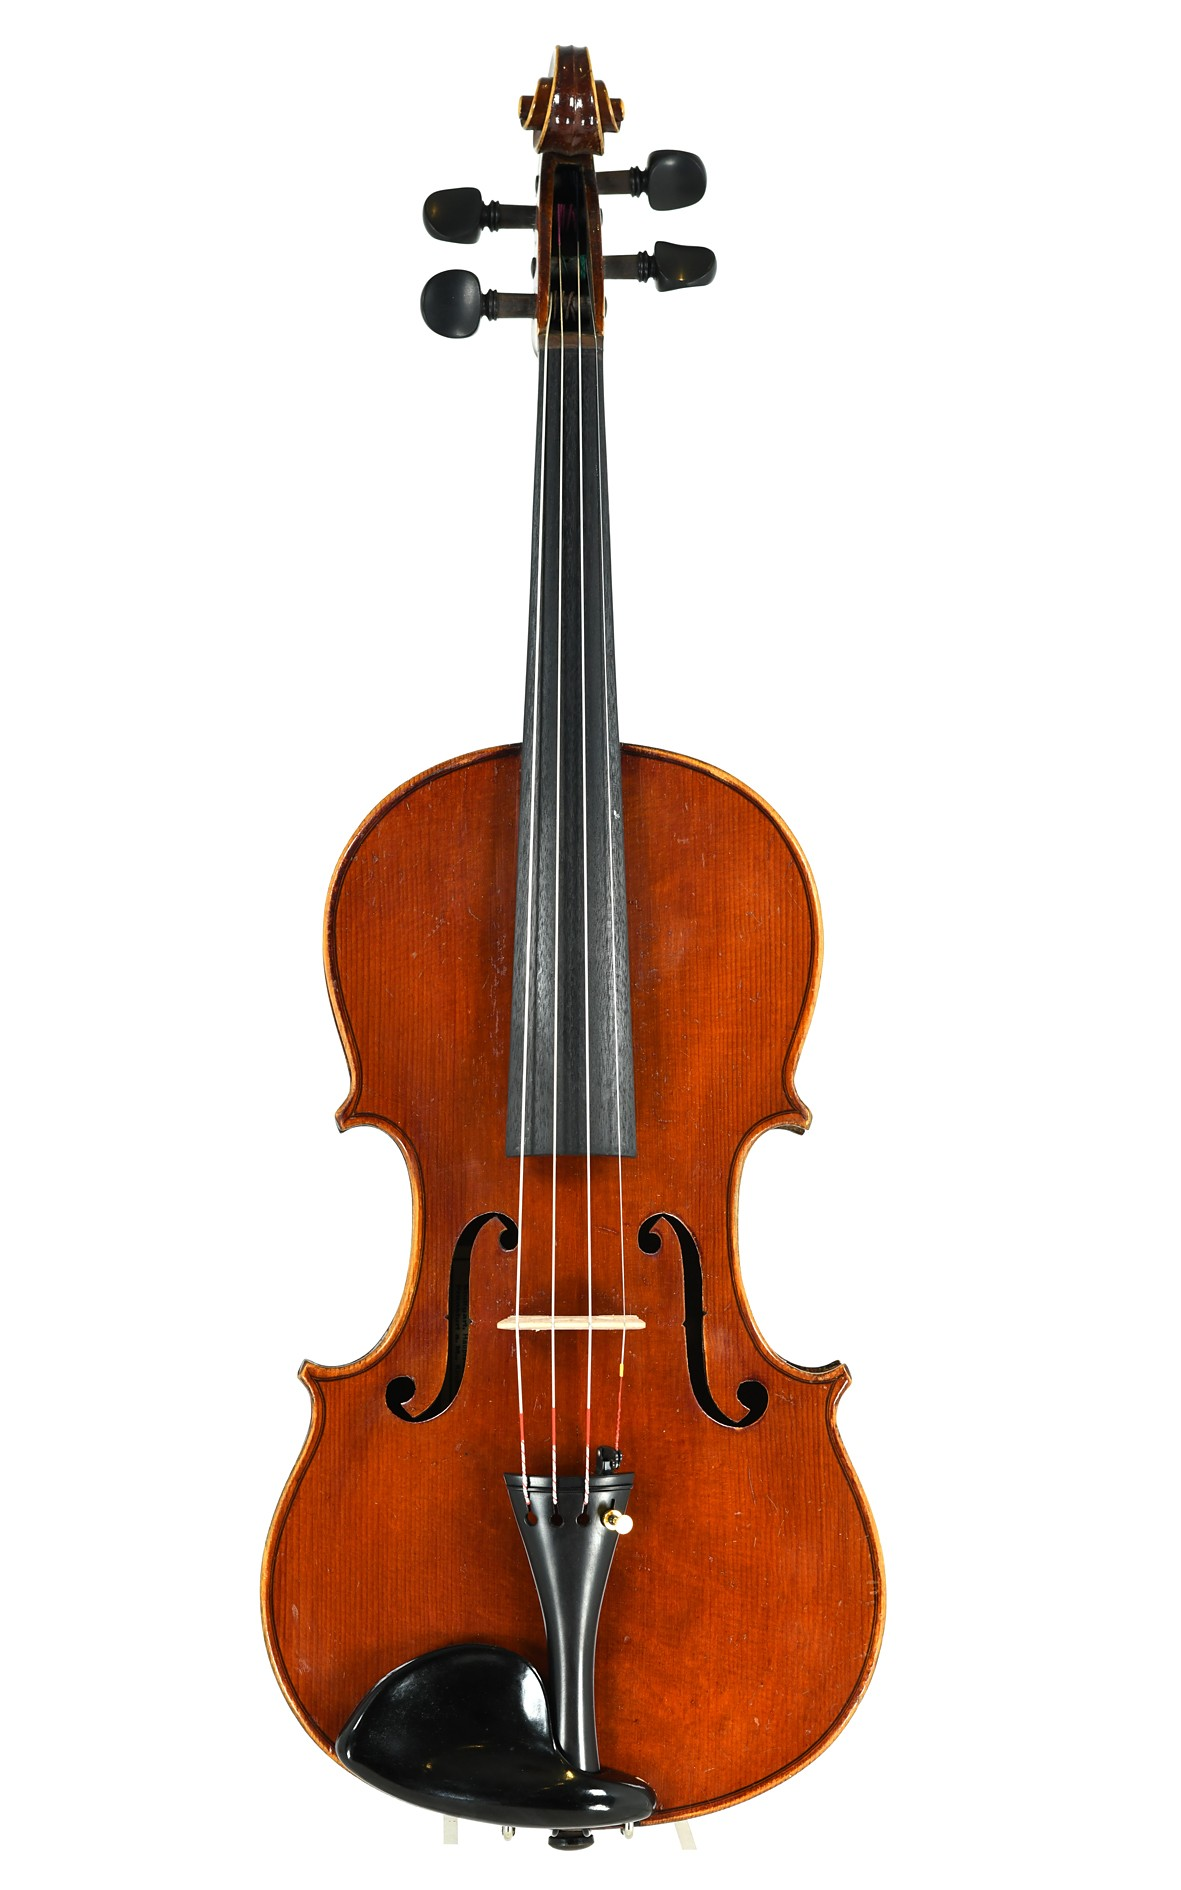 Markneukirchen violin after Amati ca. 1900